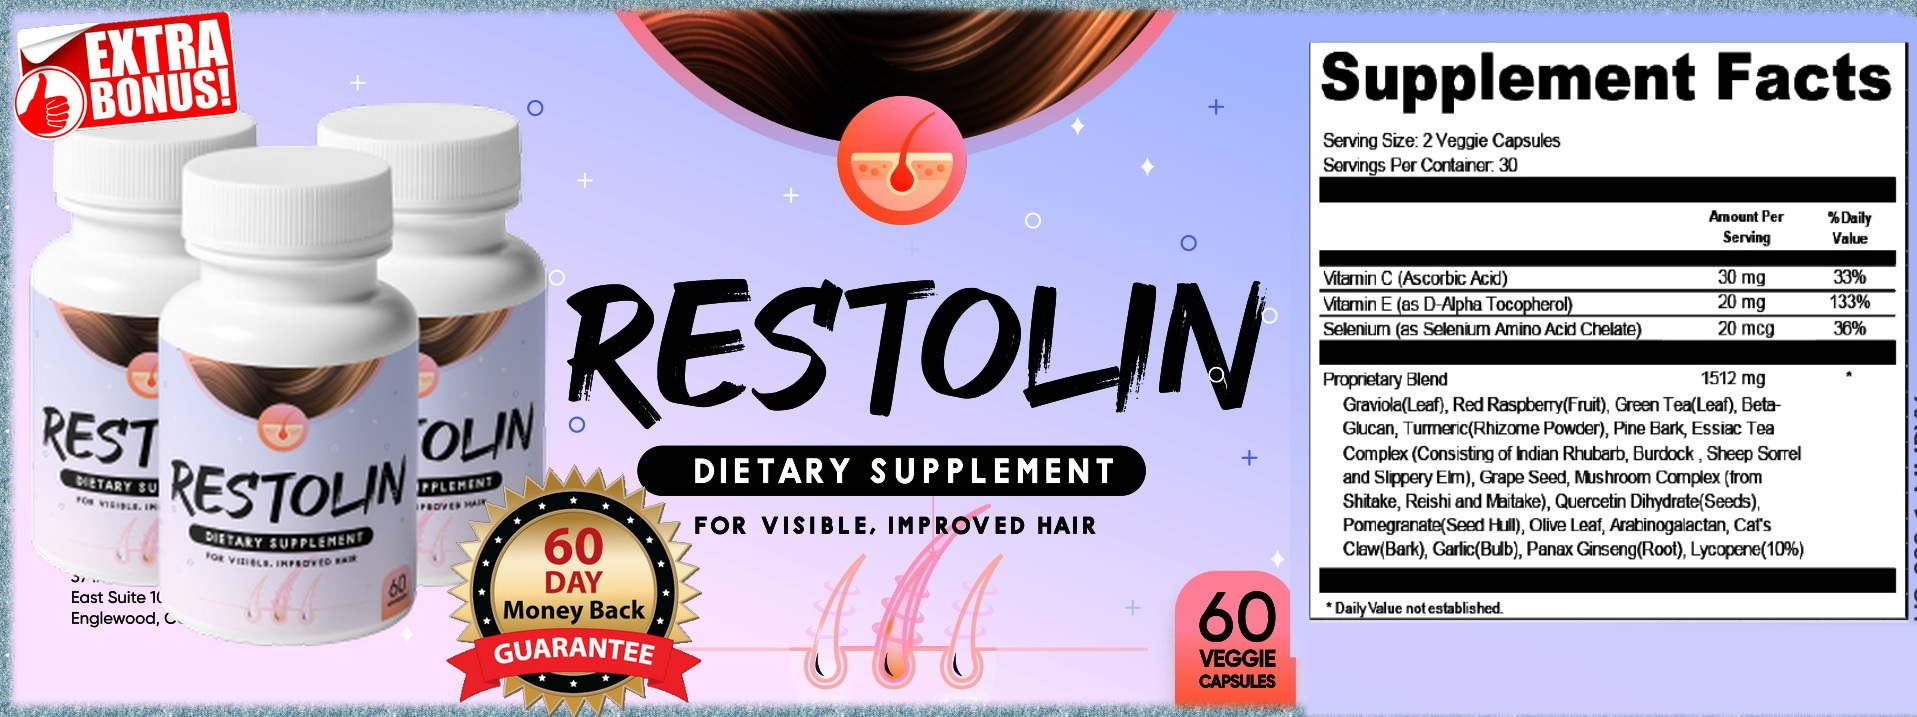 Restolin Healthy Hair Reviews